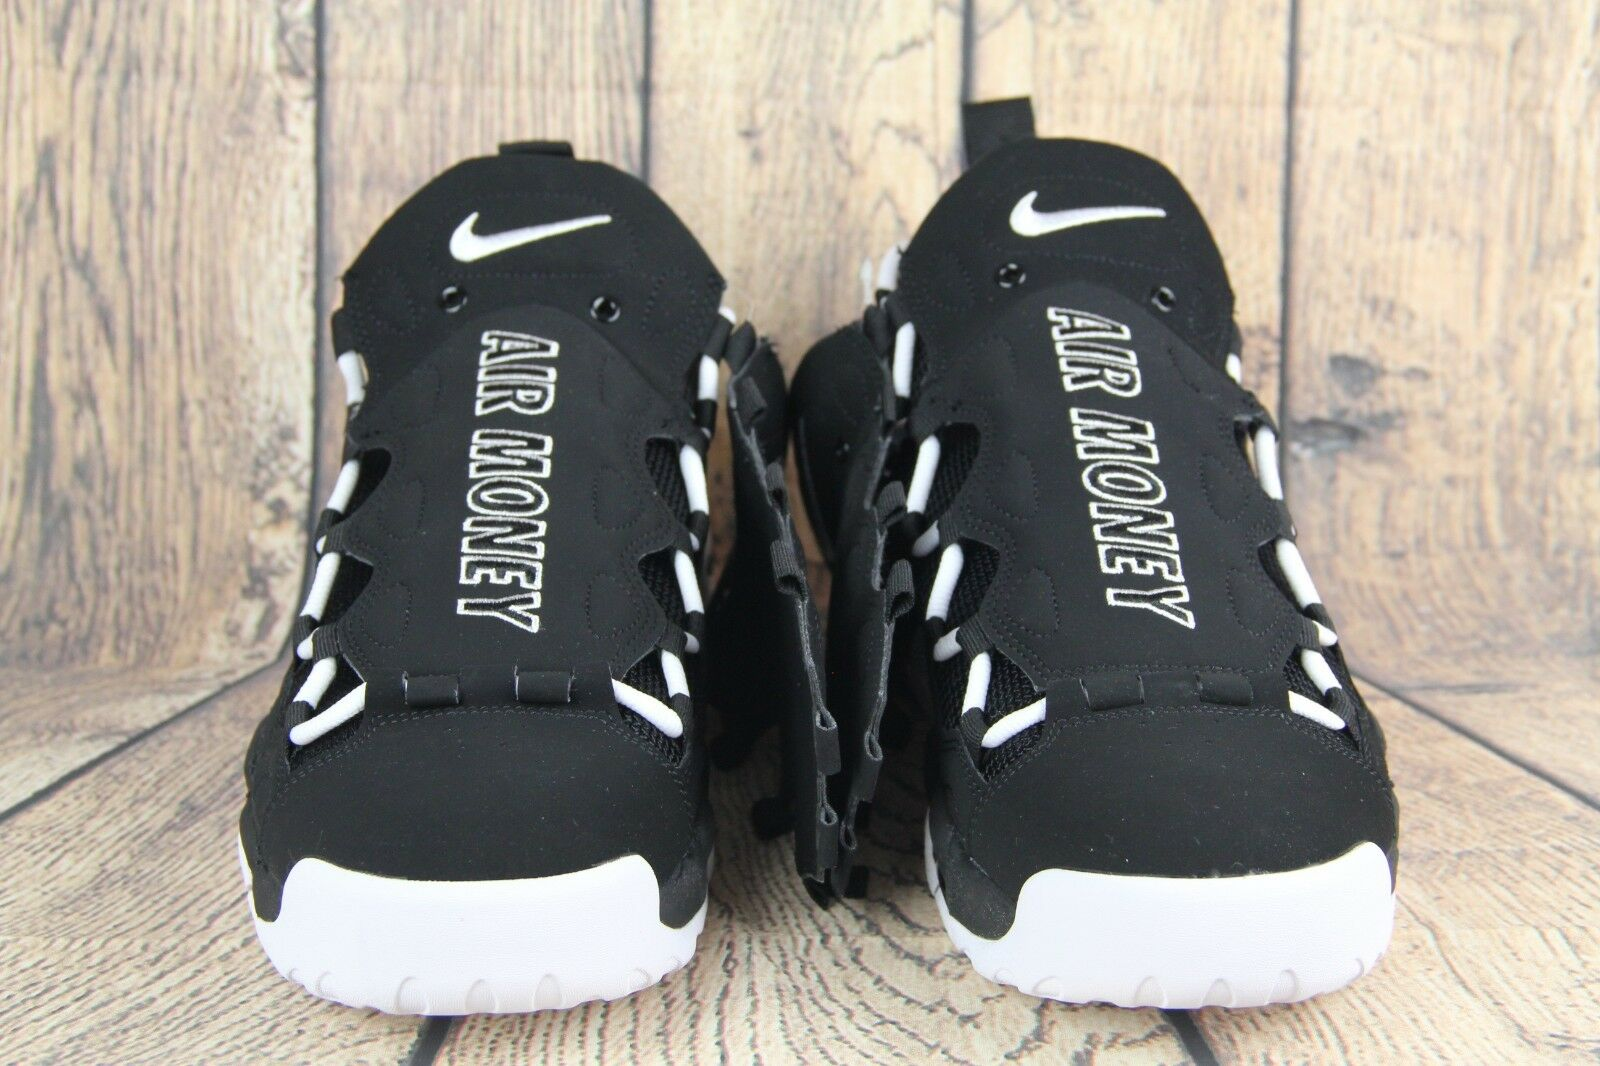 Nike air max piu 'soldi di rara Uomo ritmo bianco nero aj2998-001 sz 10